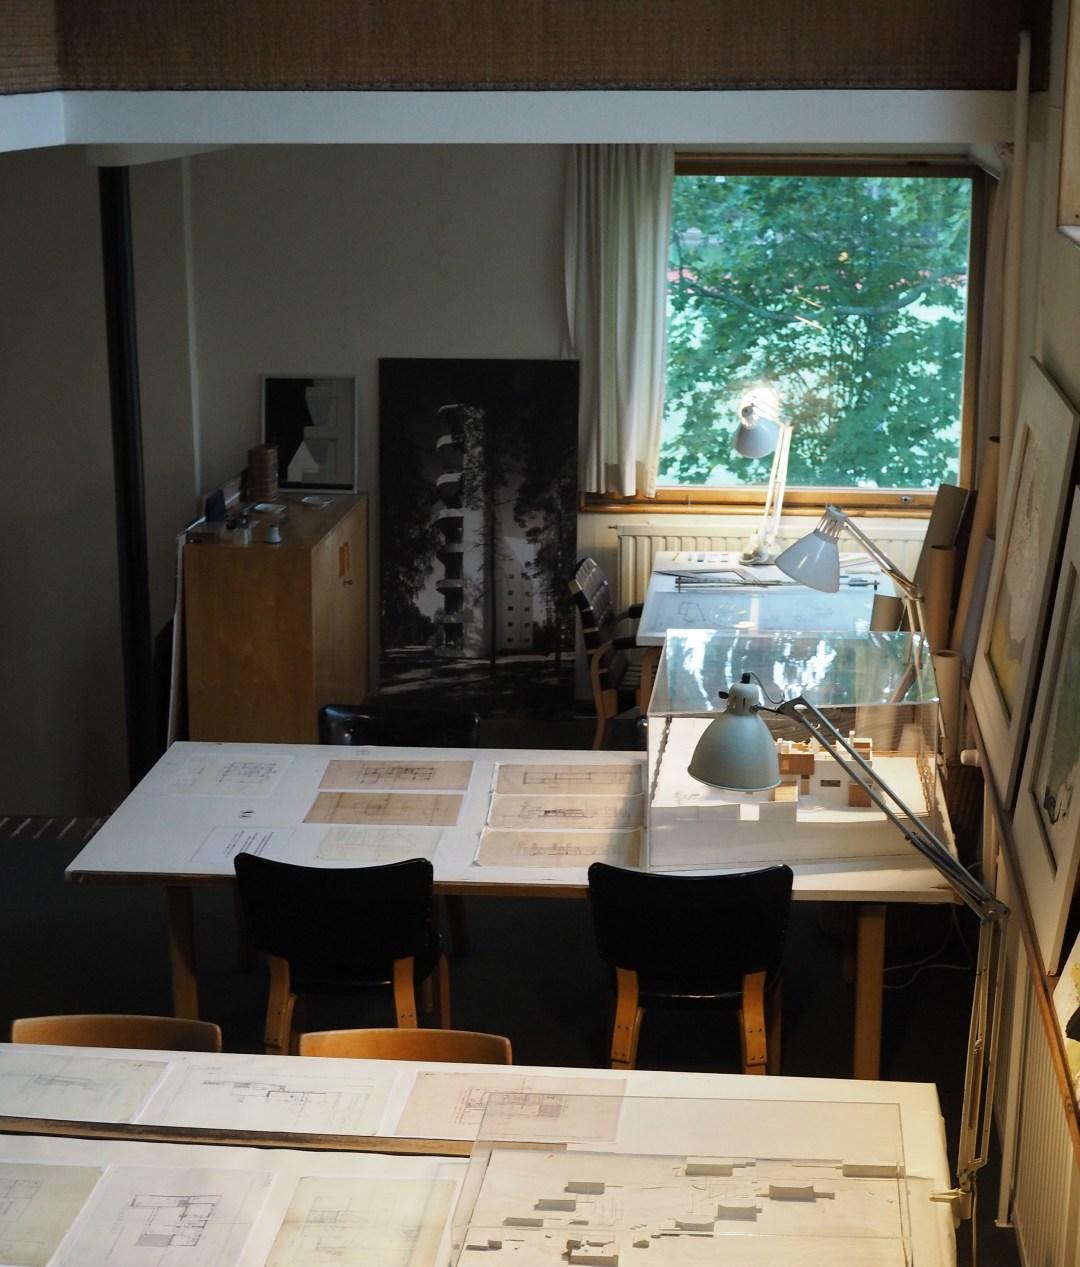 Alvar Aalto's home office